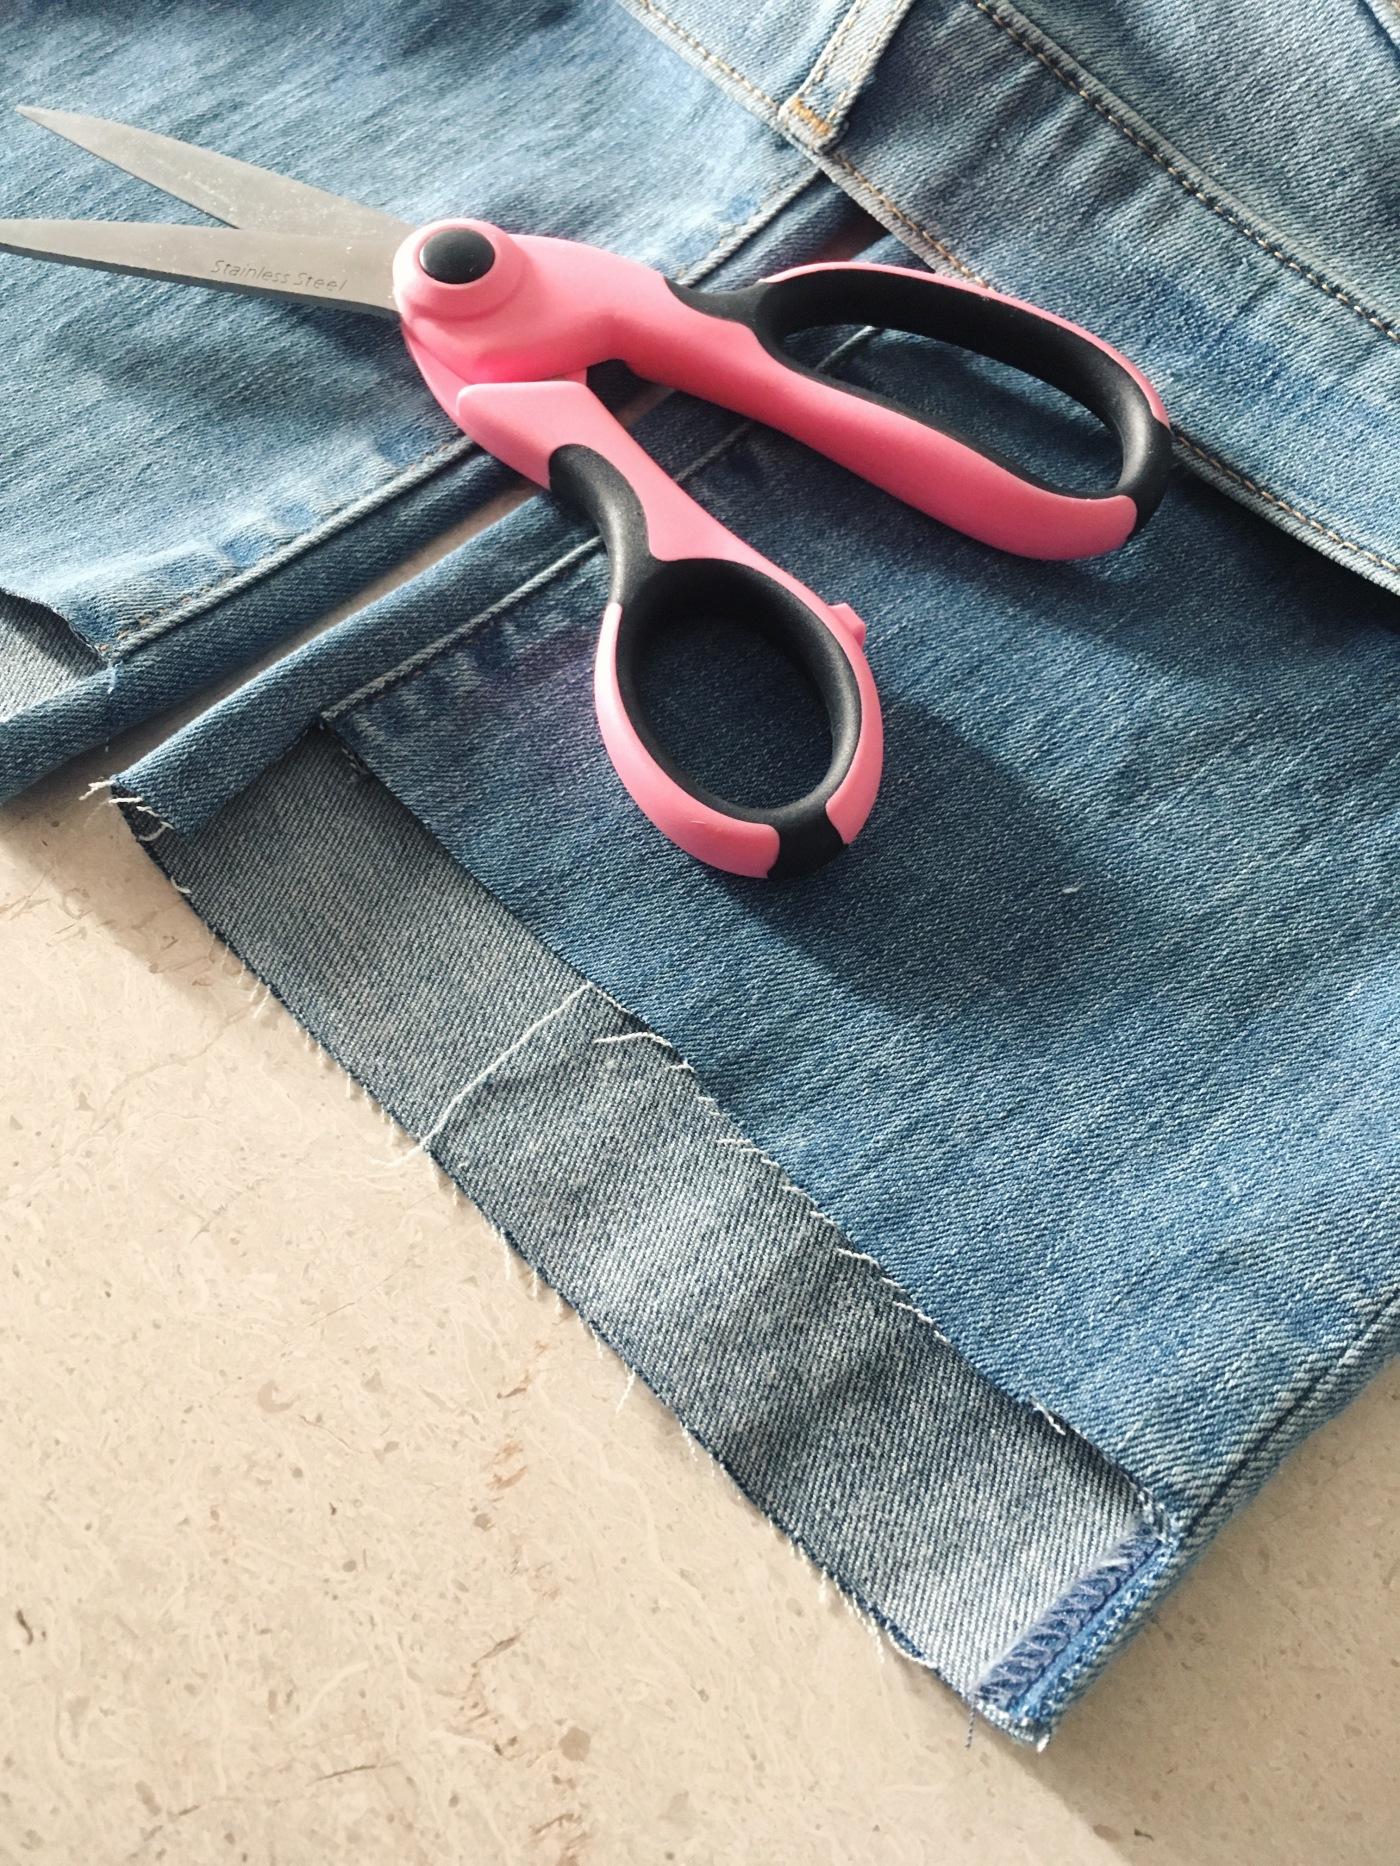 DIY step hem jeans, denim trends 2017